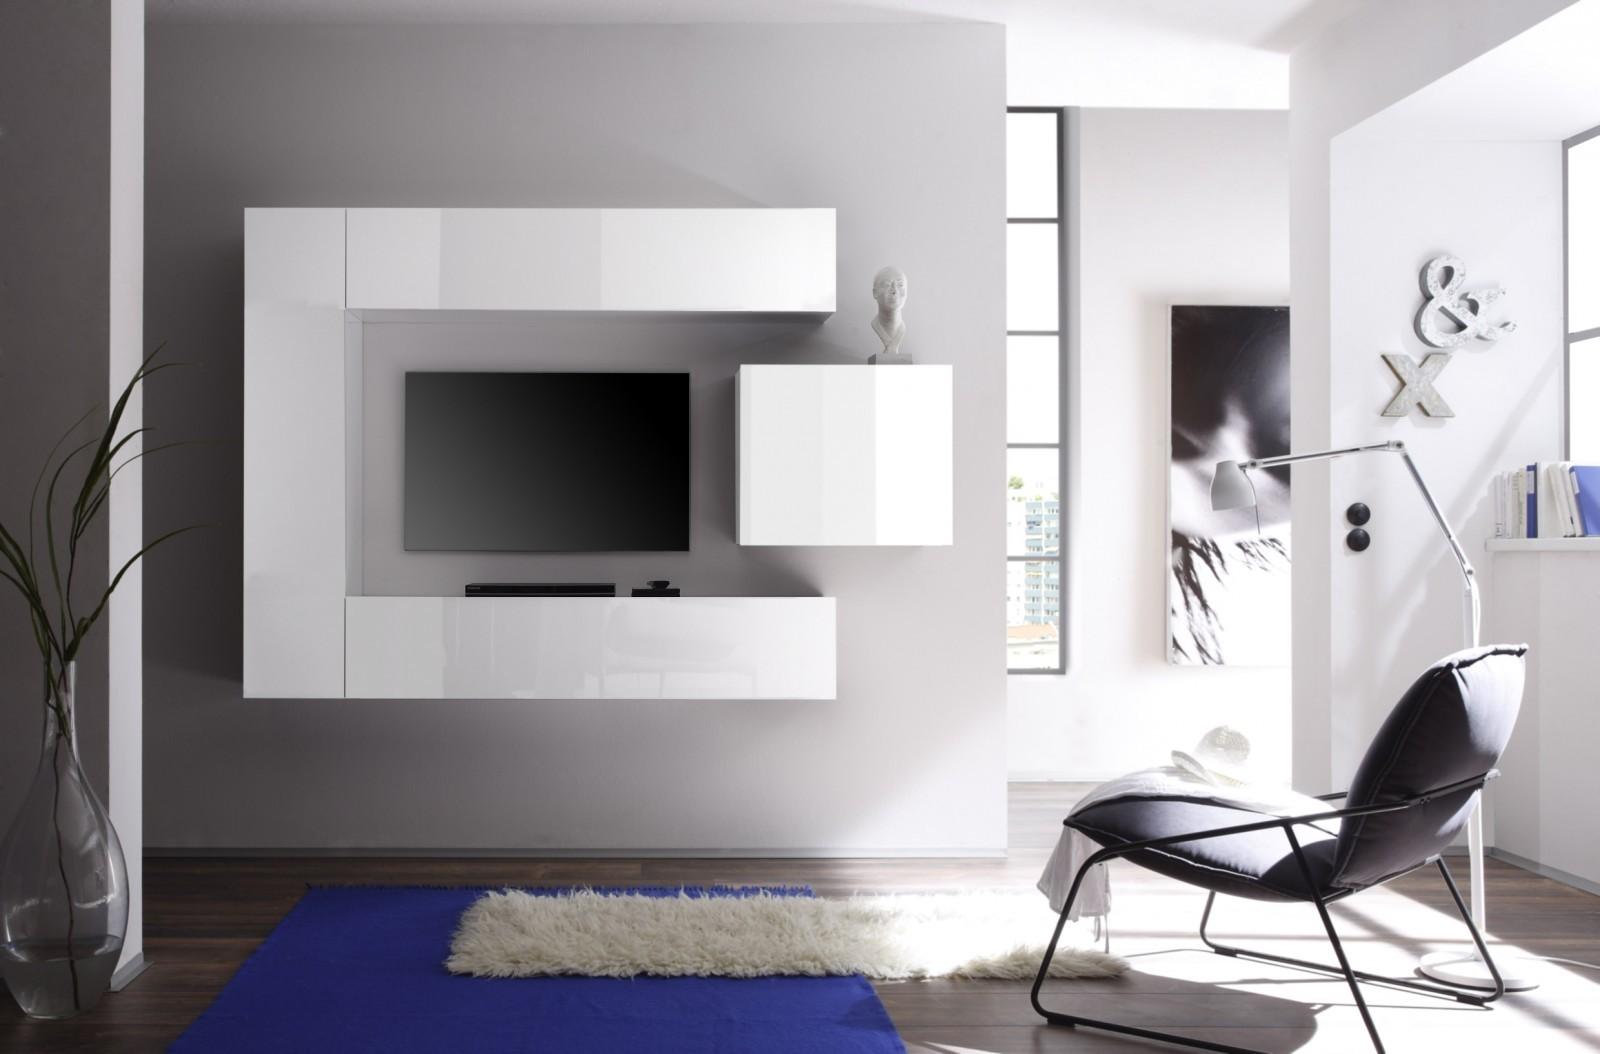 Meuble Tv Murale Meuble Tv Murale Design Ronna Mobilo Design  # Meuble Tv Mural Alinea